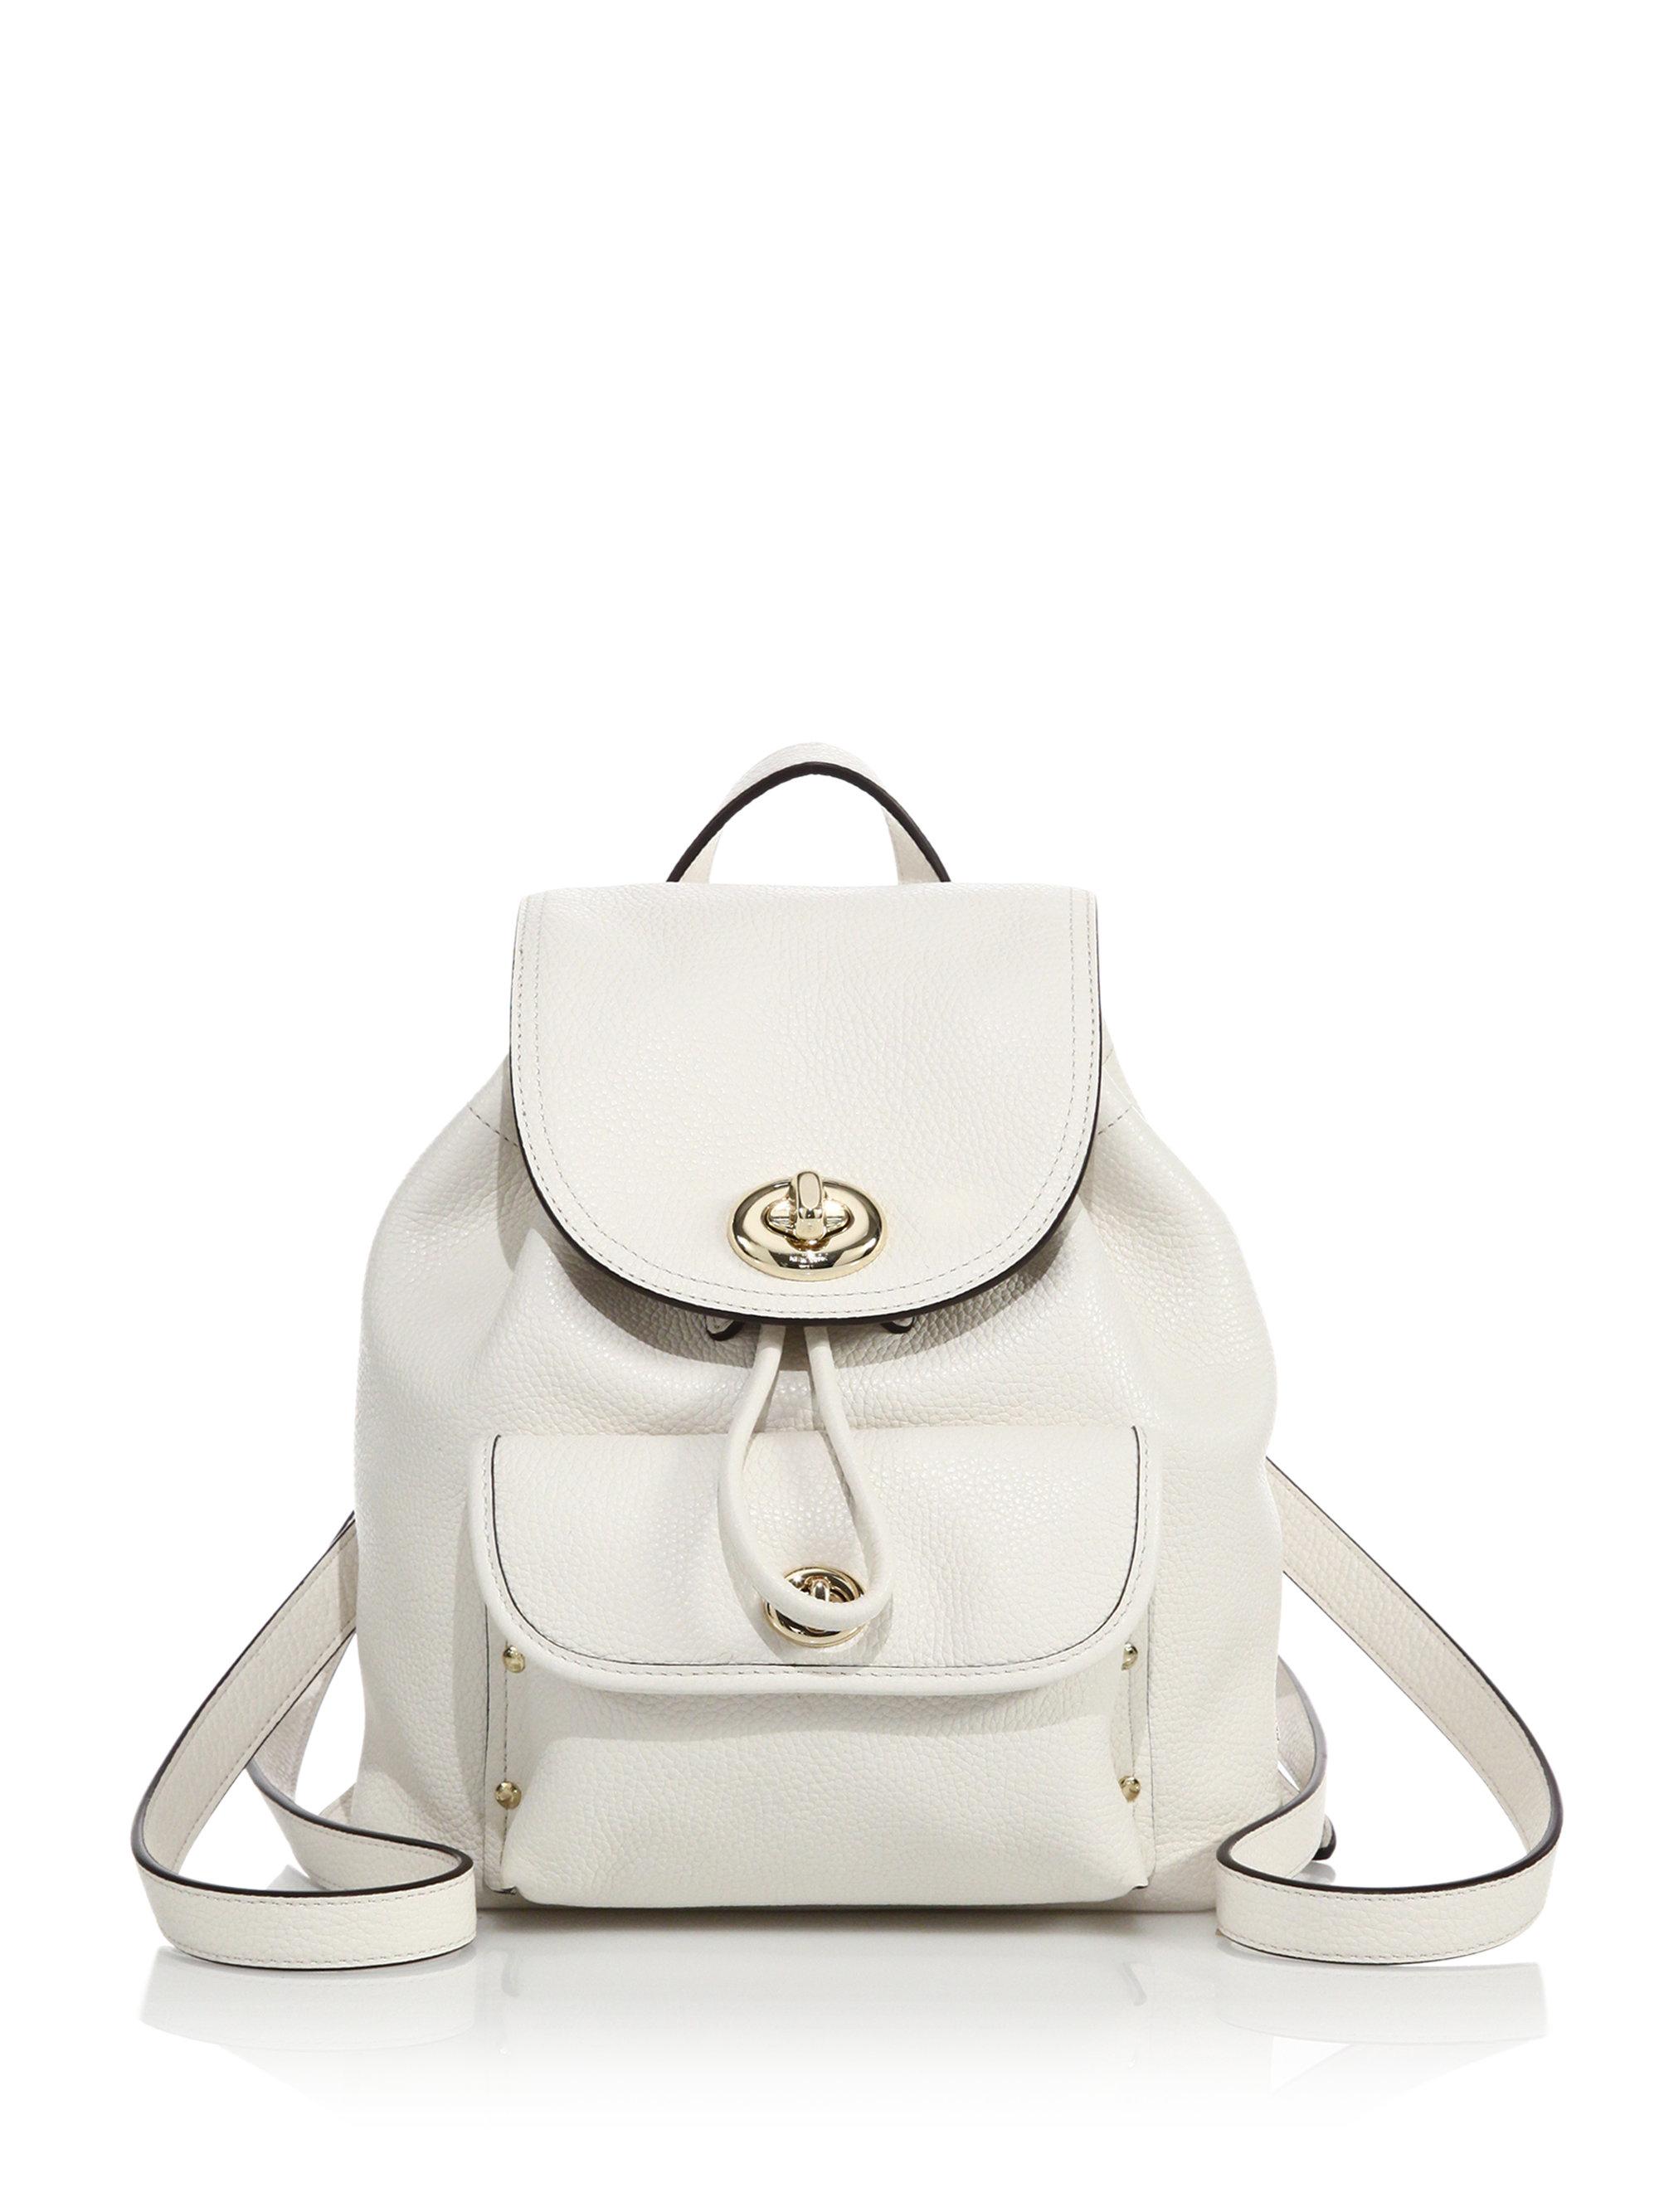 Switzerland Lyst Coach Mini Leather Turnlock Backpack In White E0f85 48626